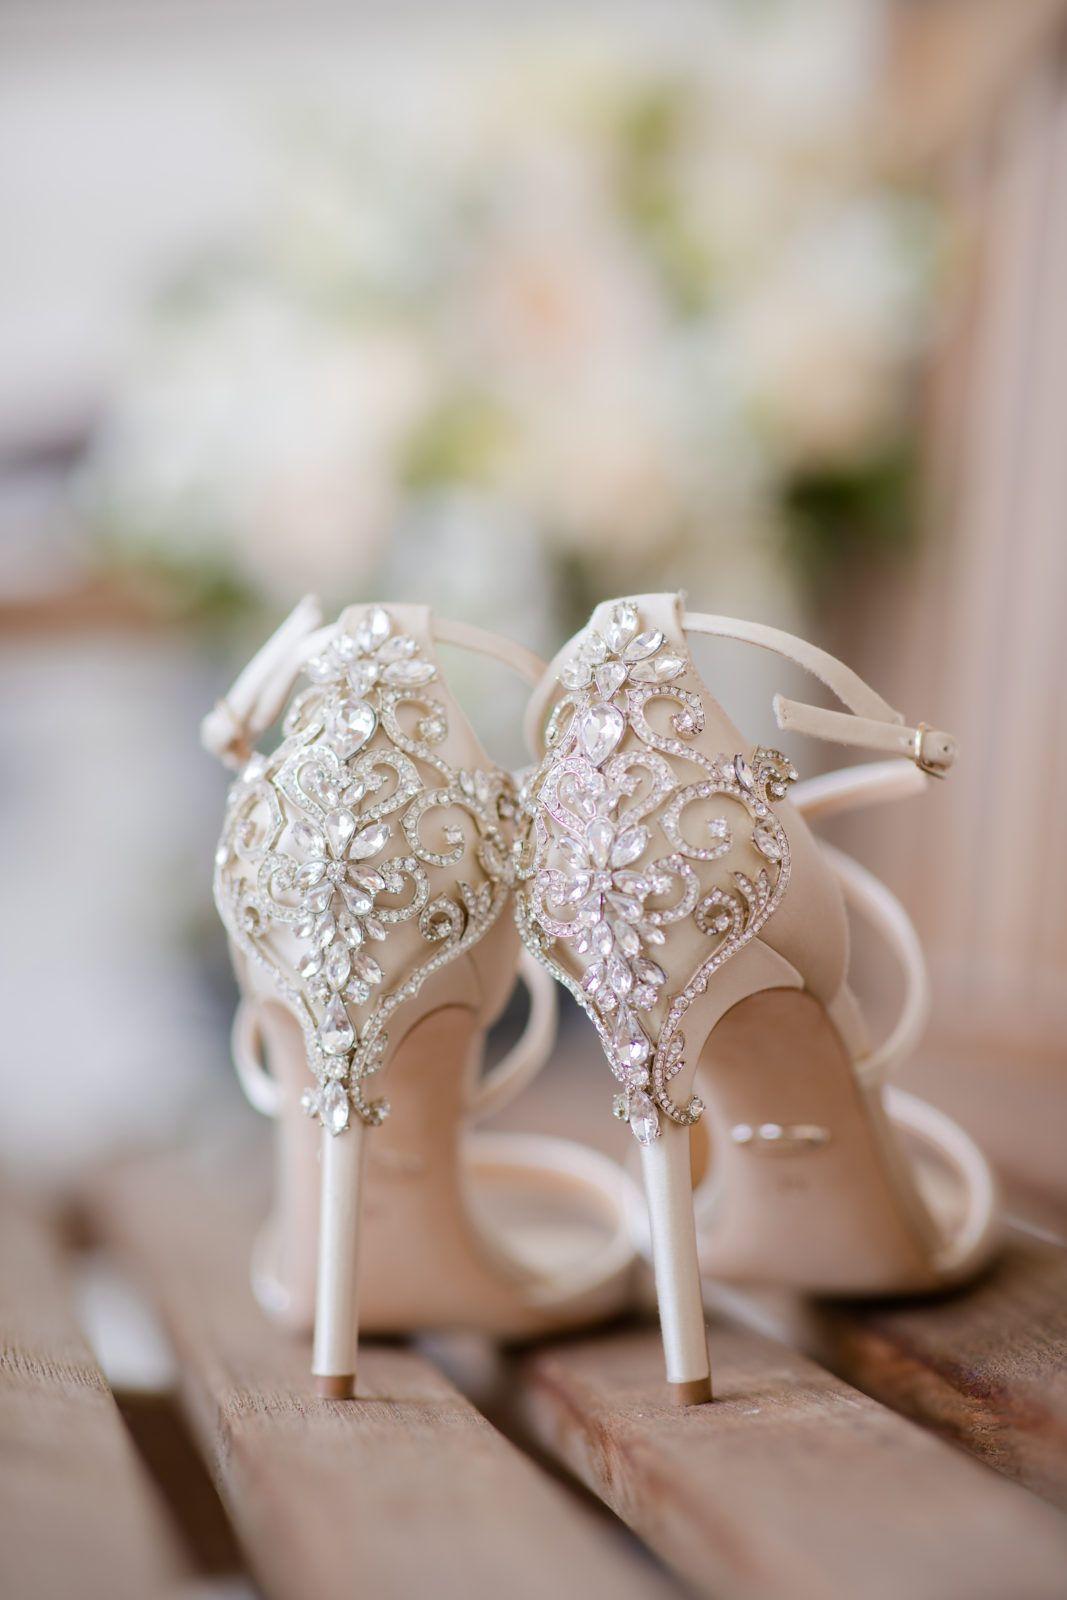 Glen Arbor Golf Club Wedding By Vanessa Joy Photography Badgley